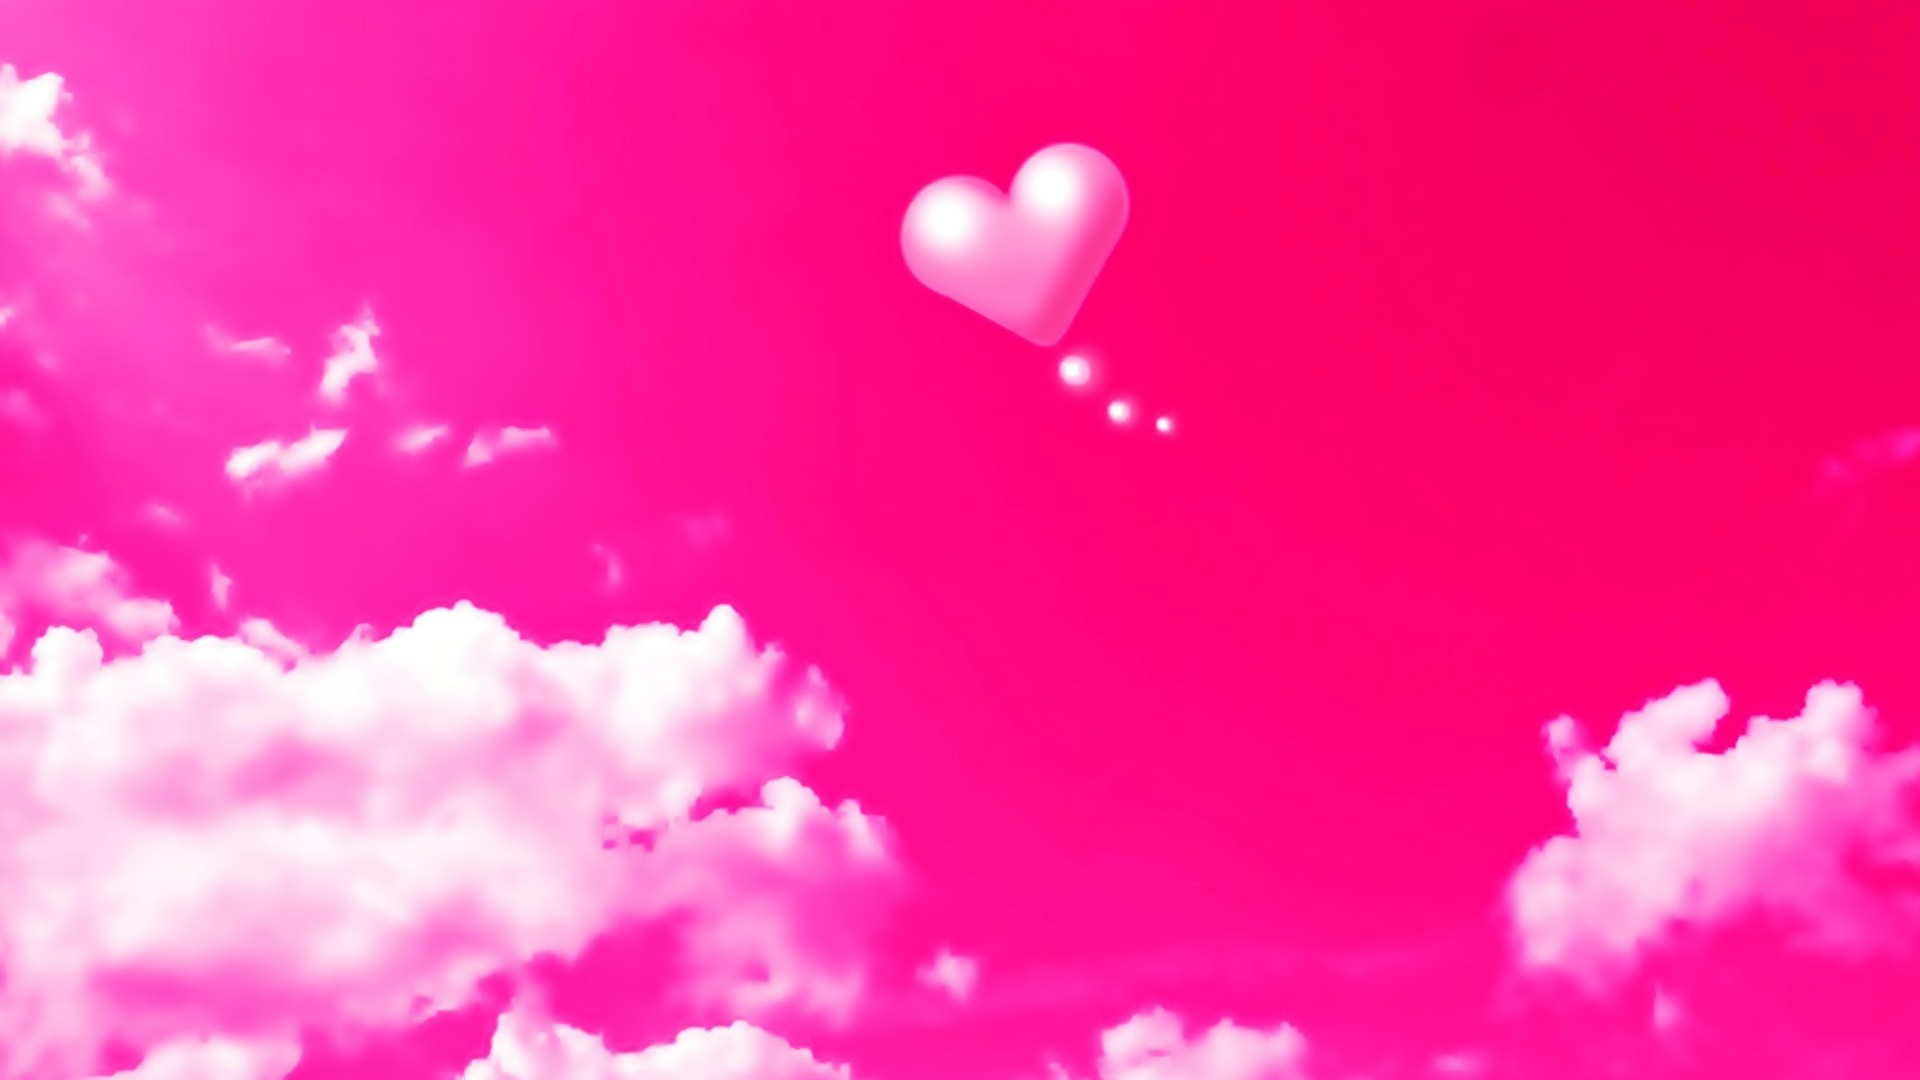 2048x1152 Light Pink Solid Color Background Hot